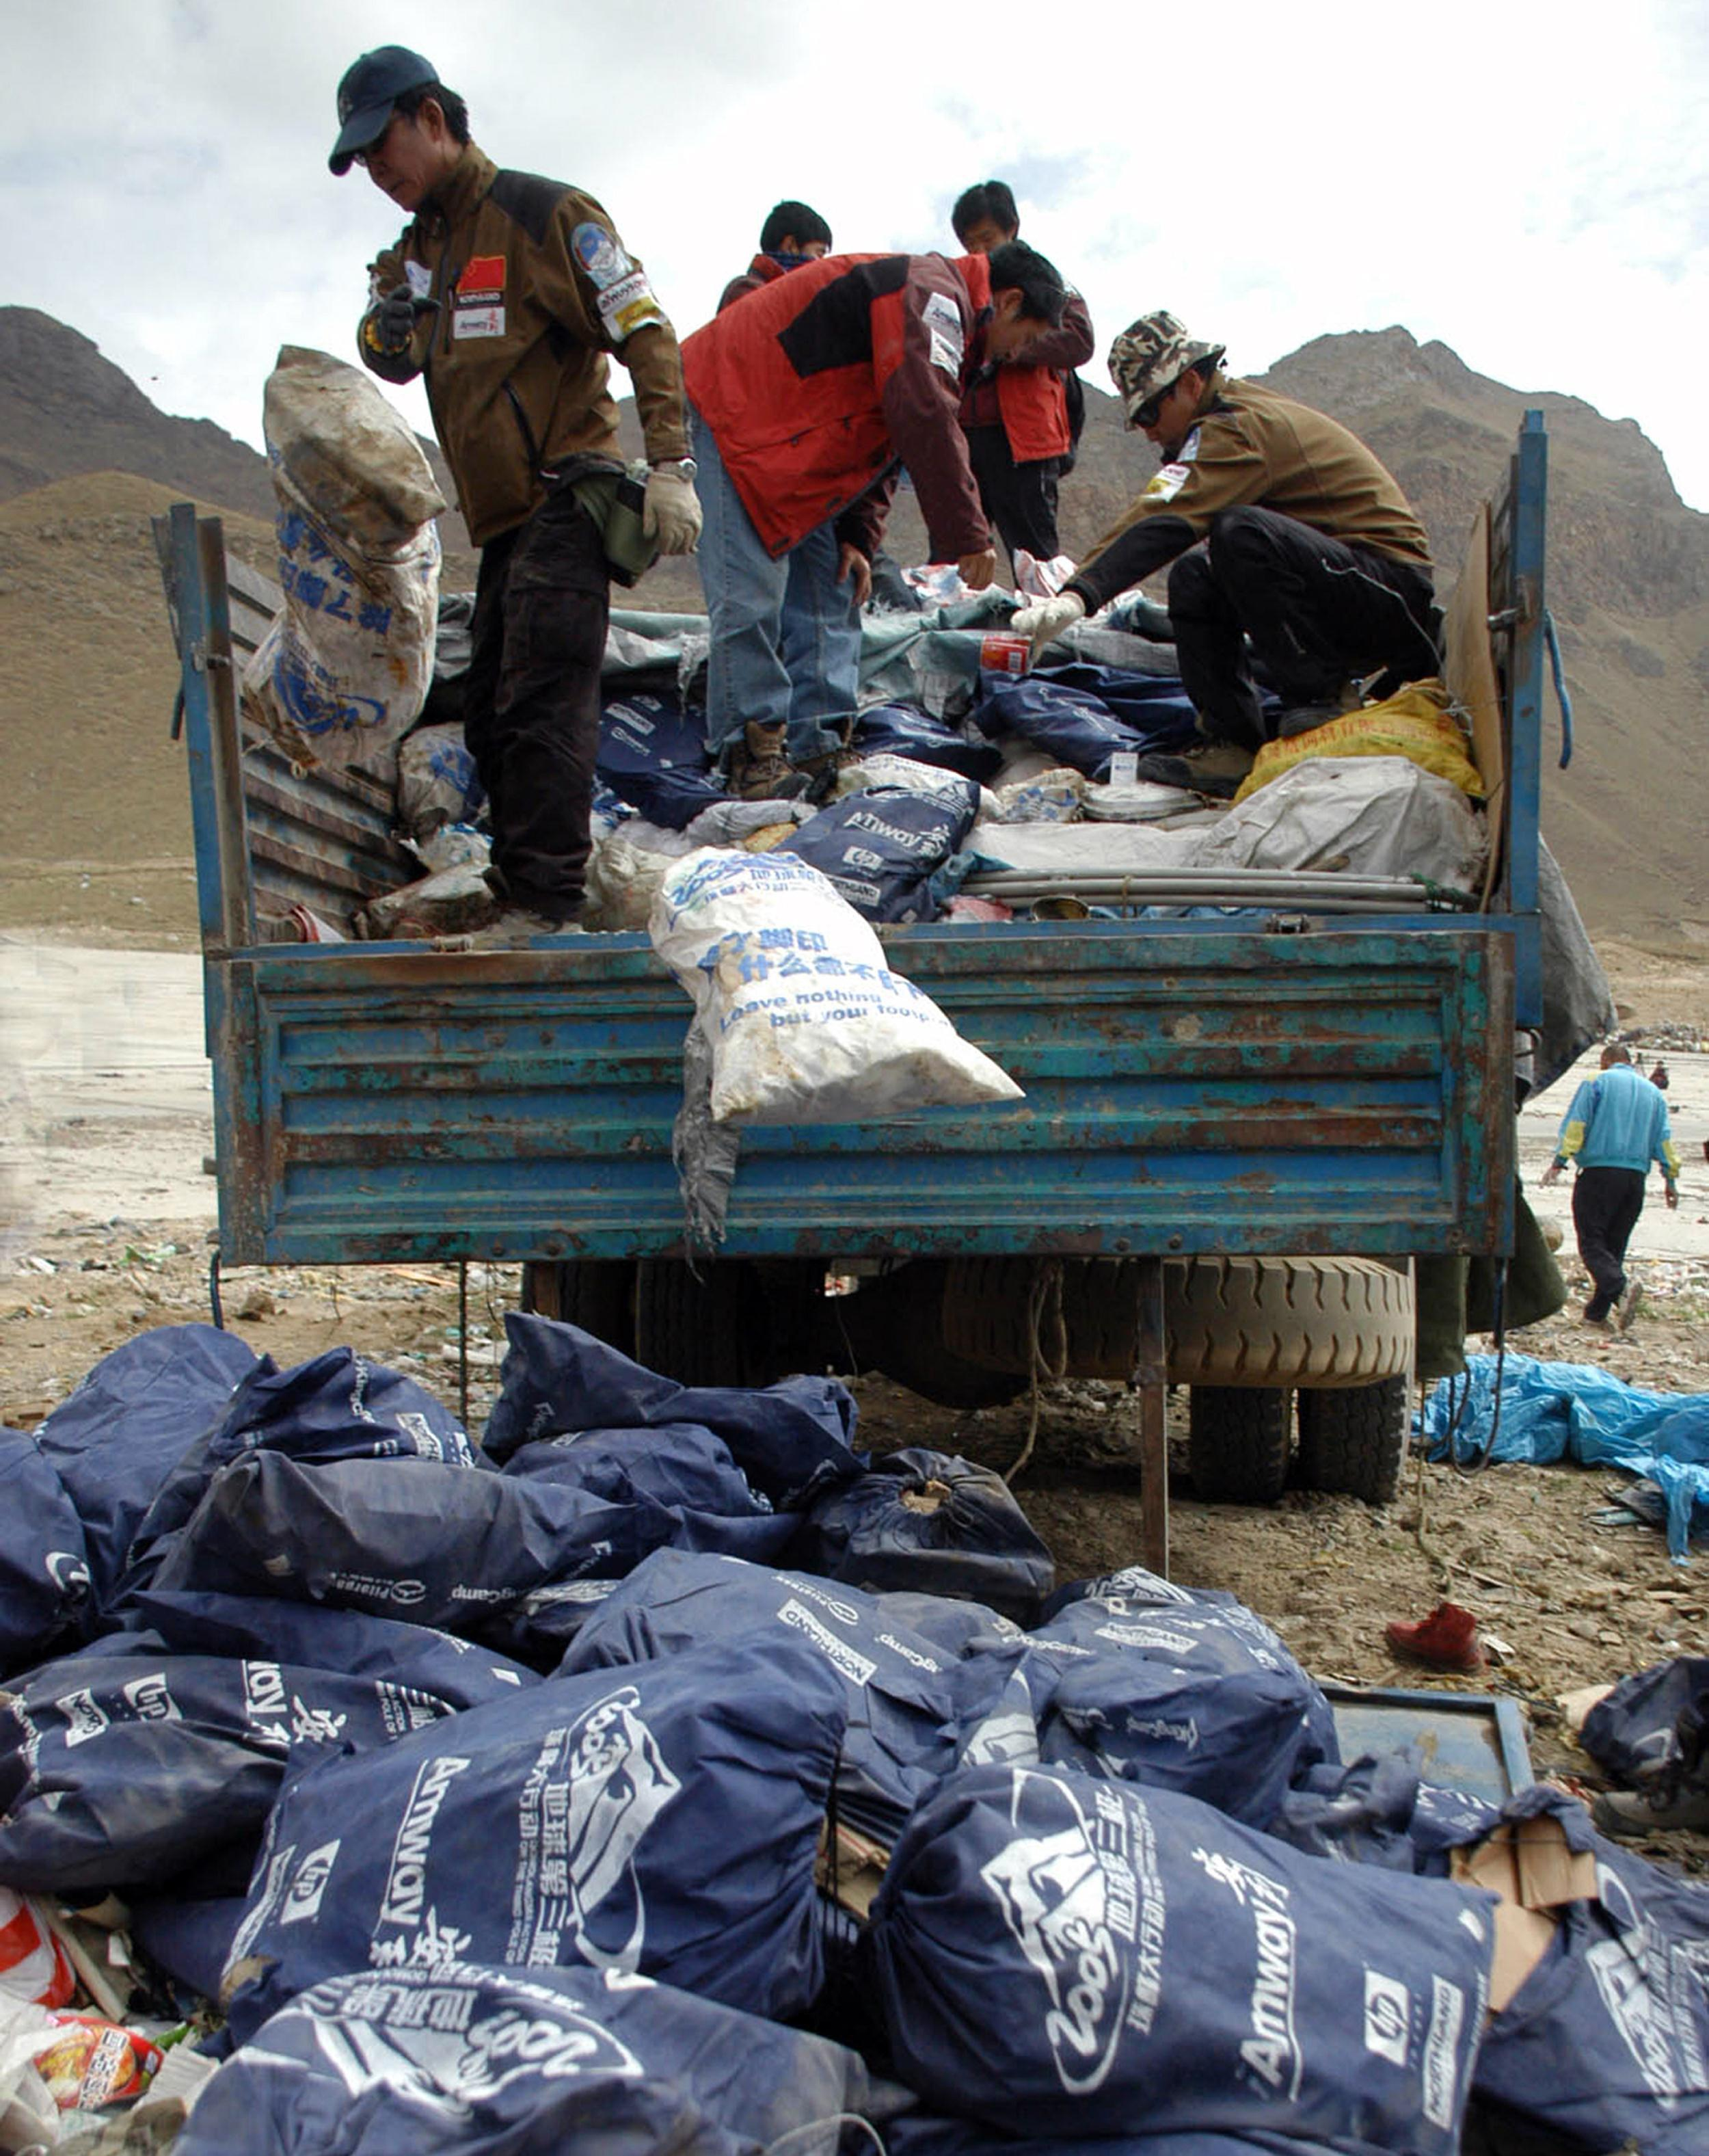 Volontari cinesi portano i rifiuti via dall'Everest